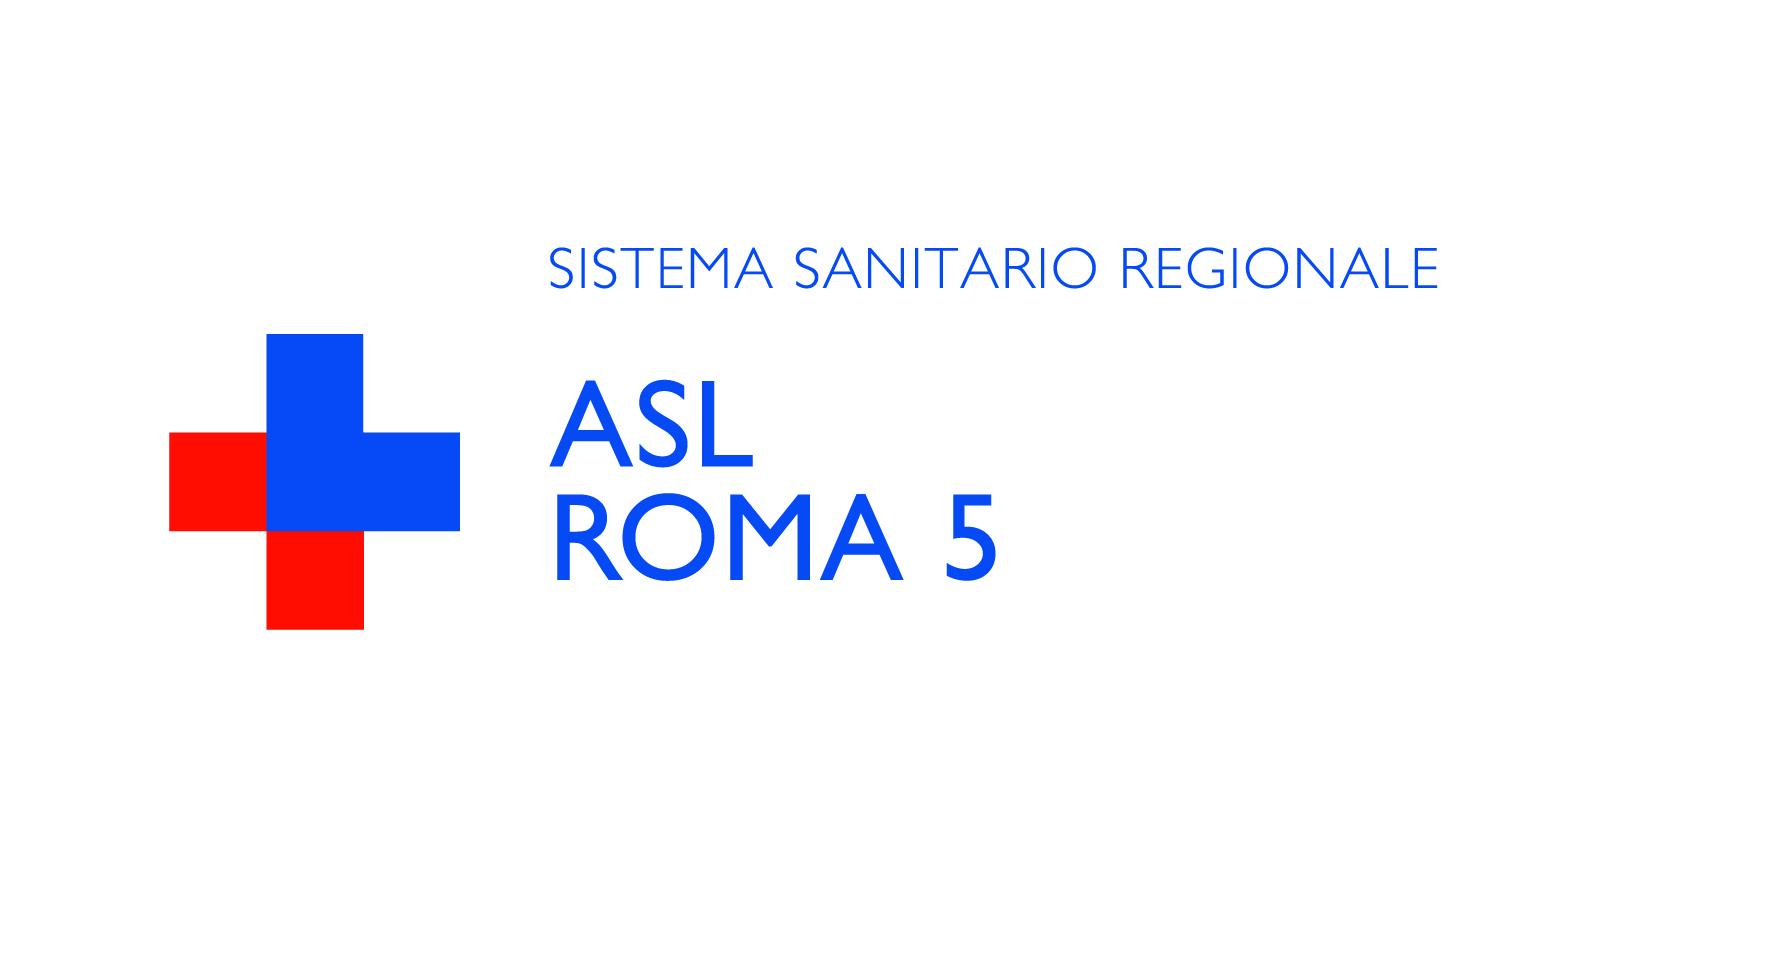 LOGO_ROMA5_POS